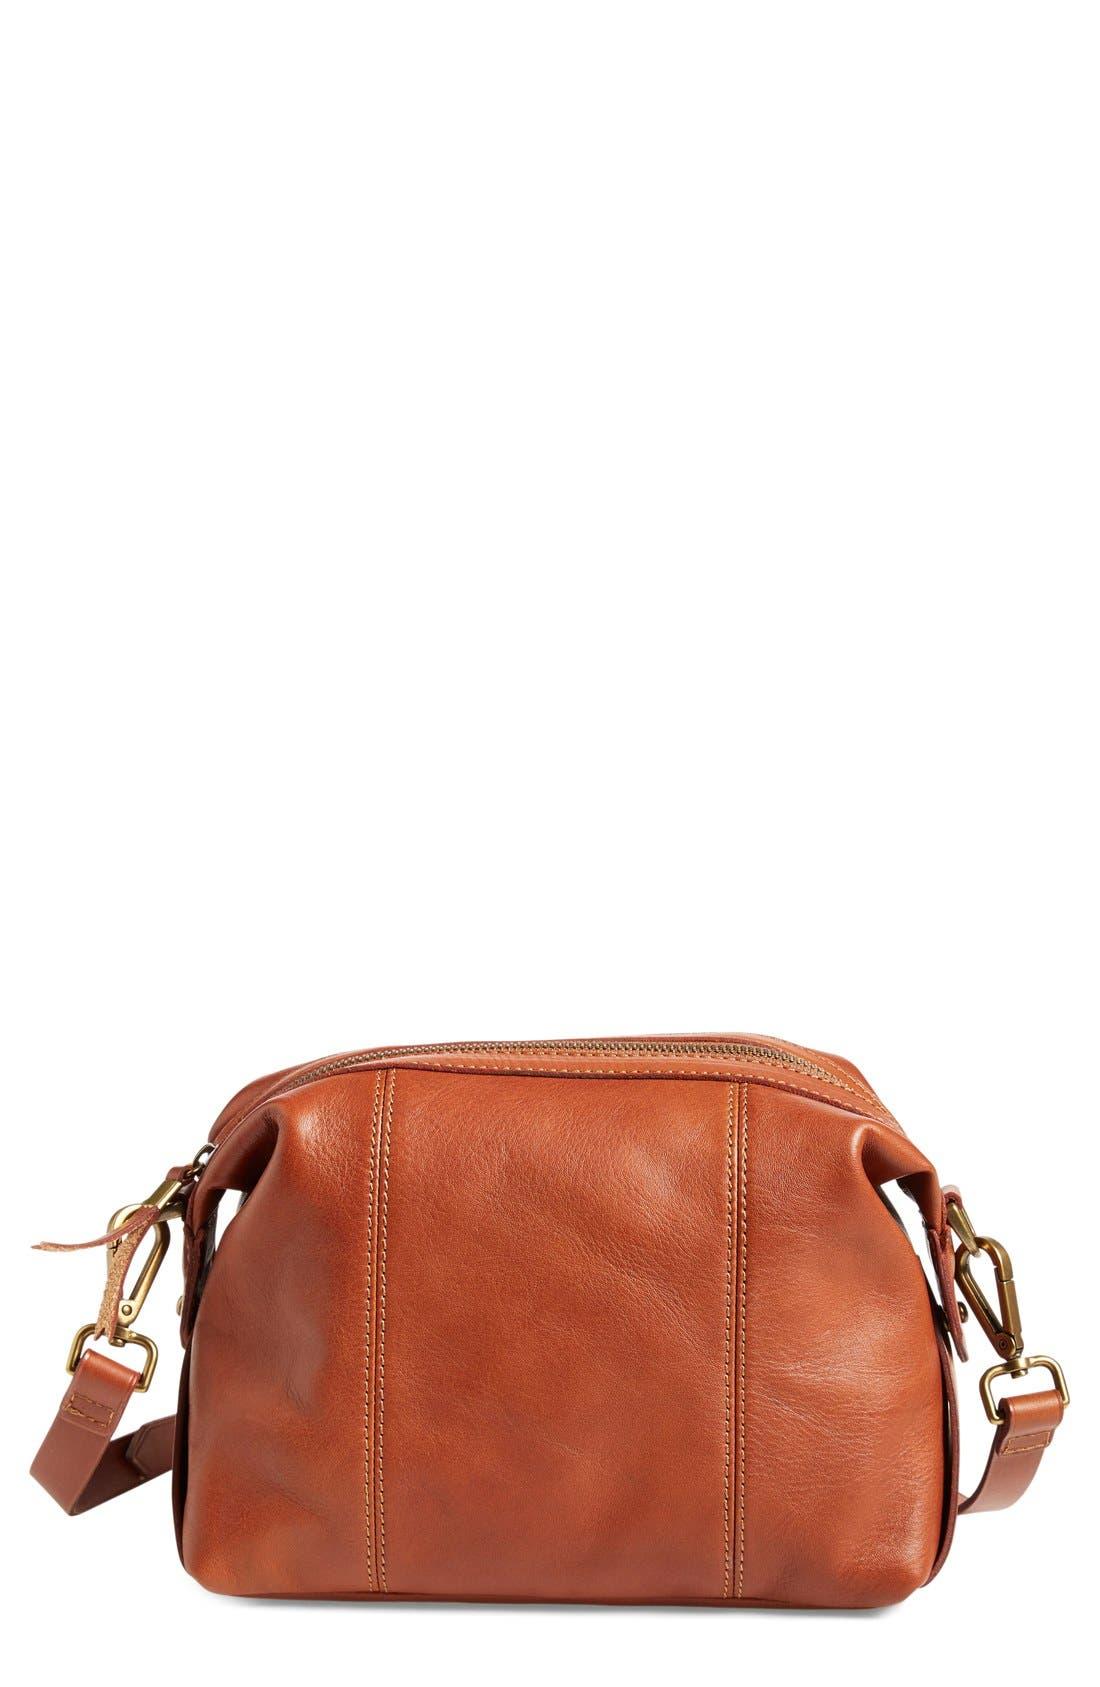 Alternate Image 1 Selected - Madewell 'Mini Glasgow' Leather Crossbody Bag